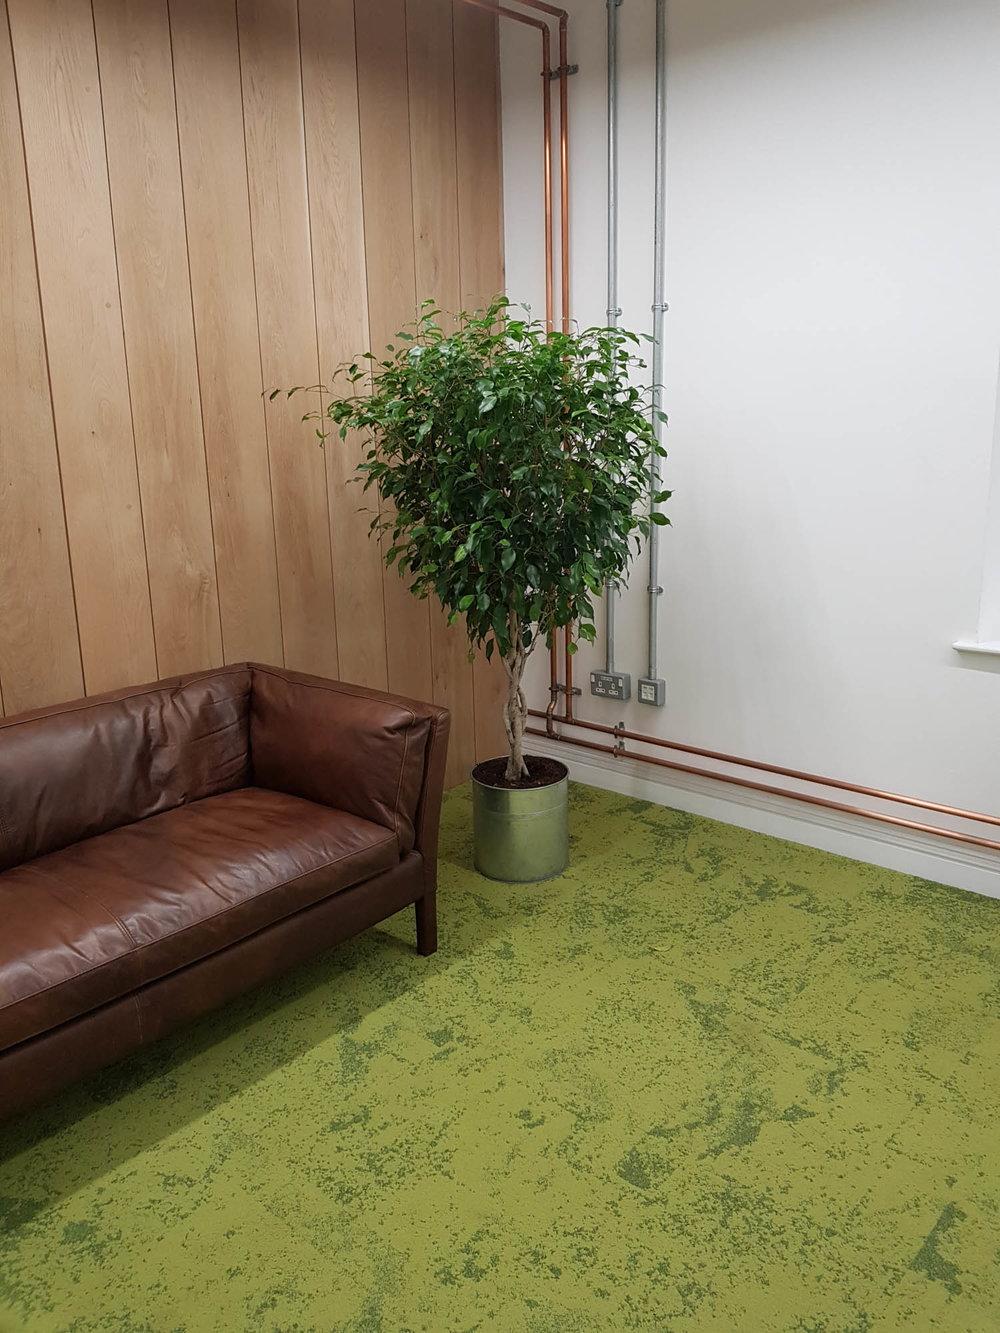 cookpad-interior-plants-mosswalls-branded-planters-plantcare-bristol-image-4